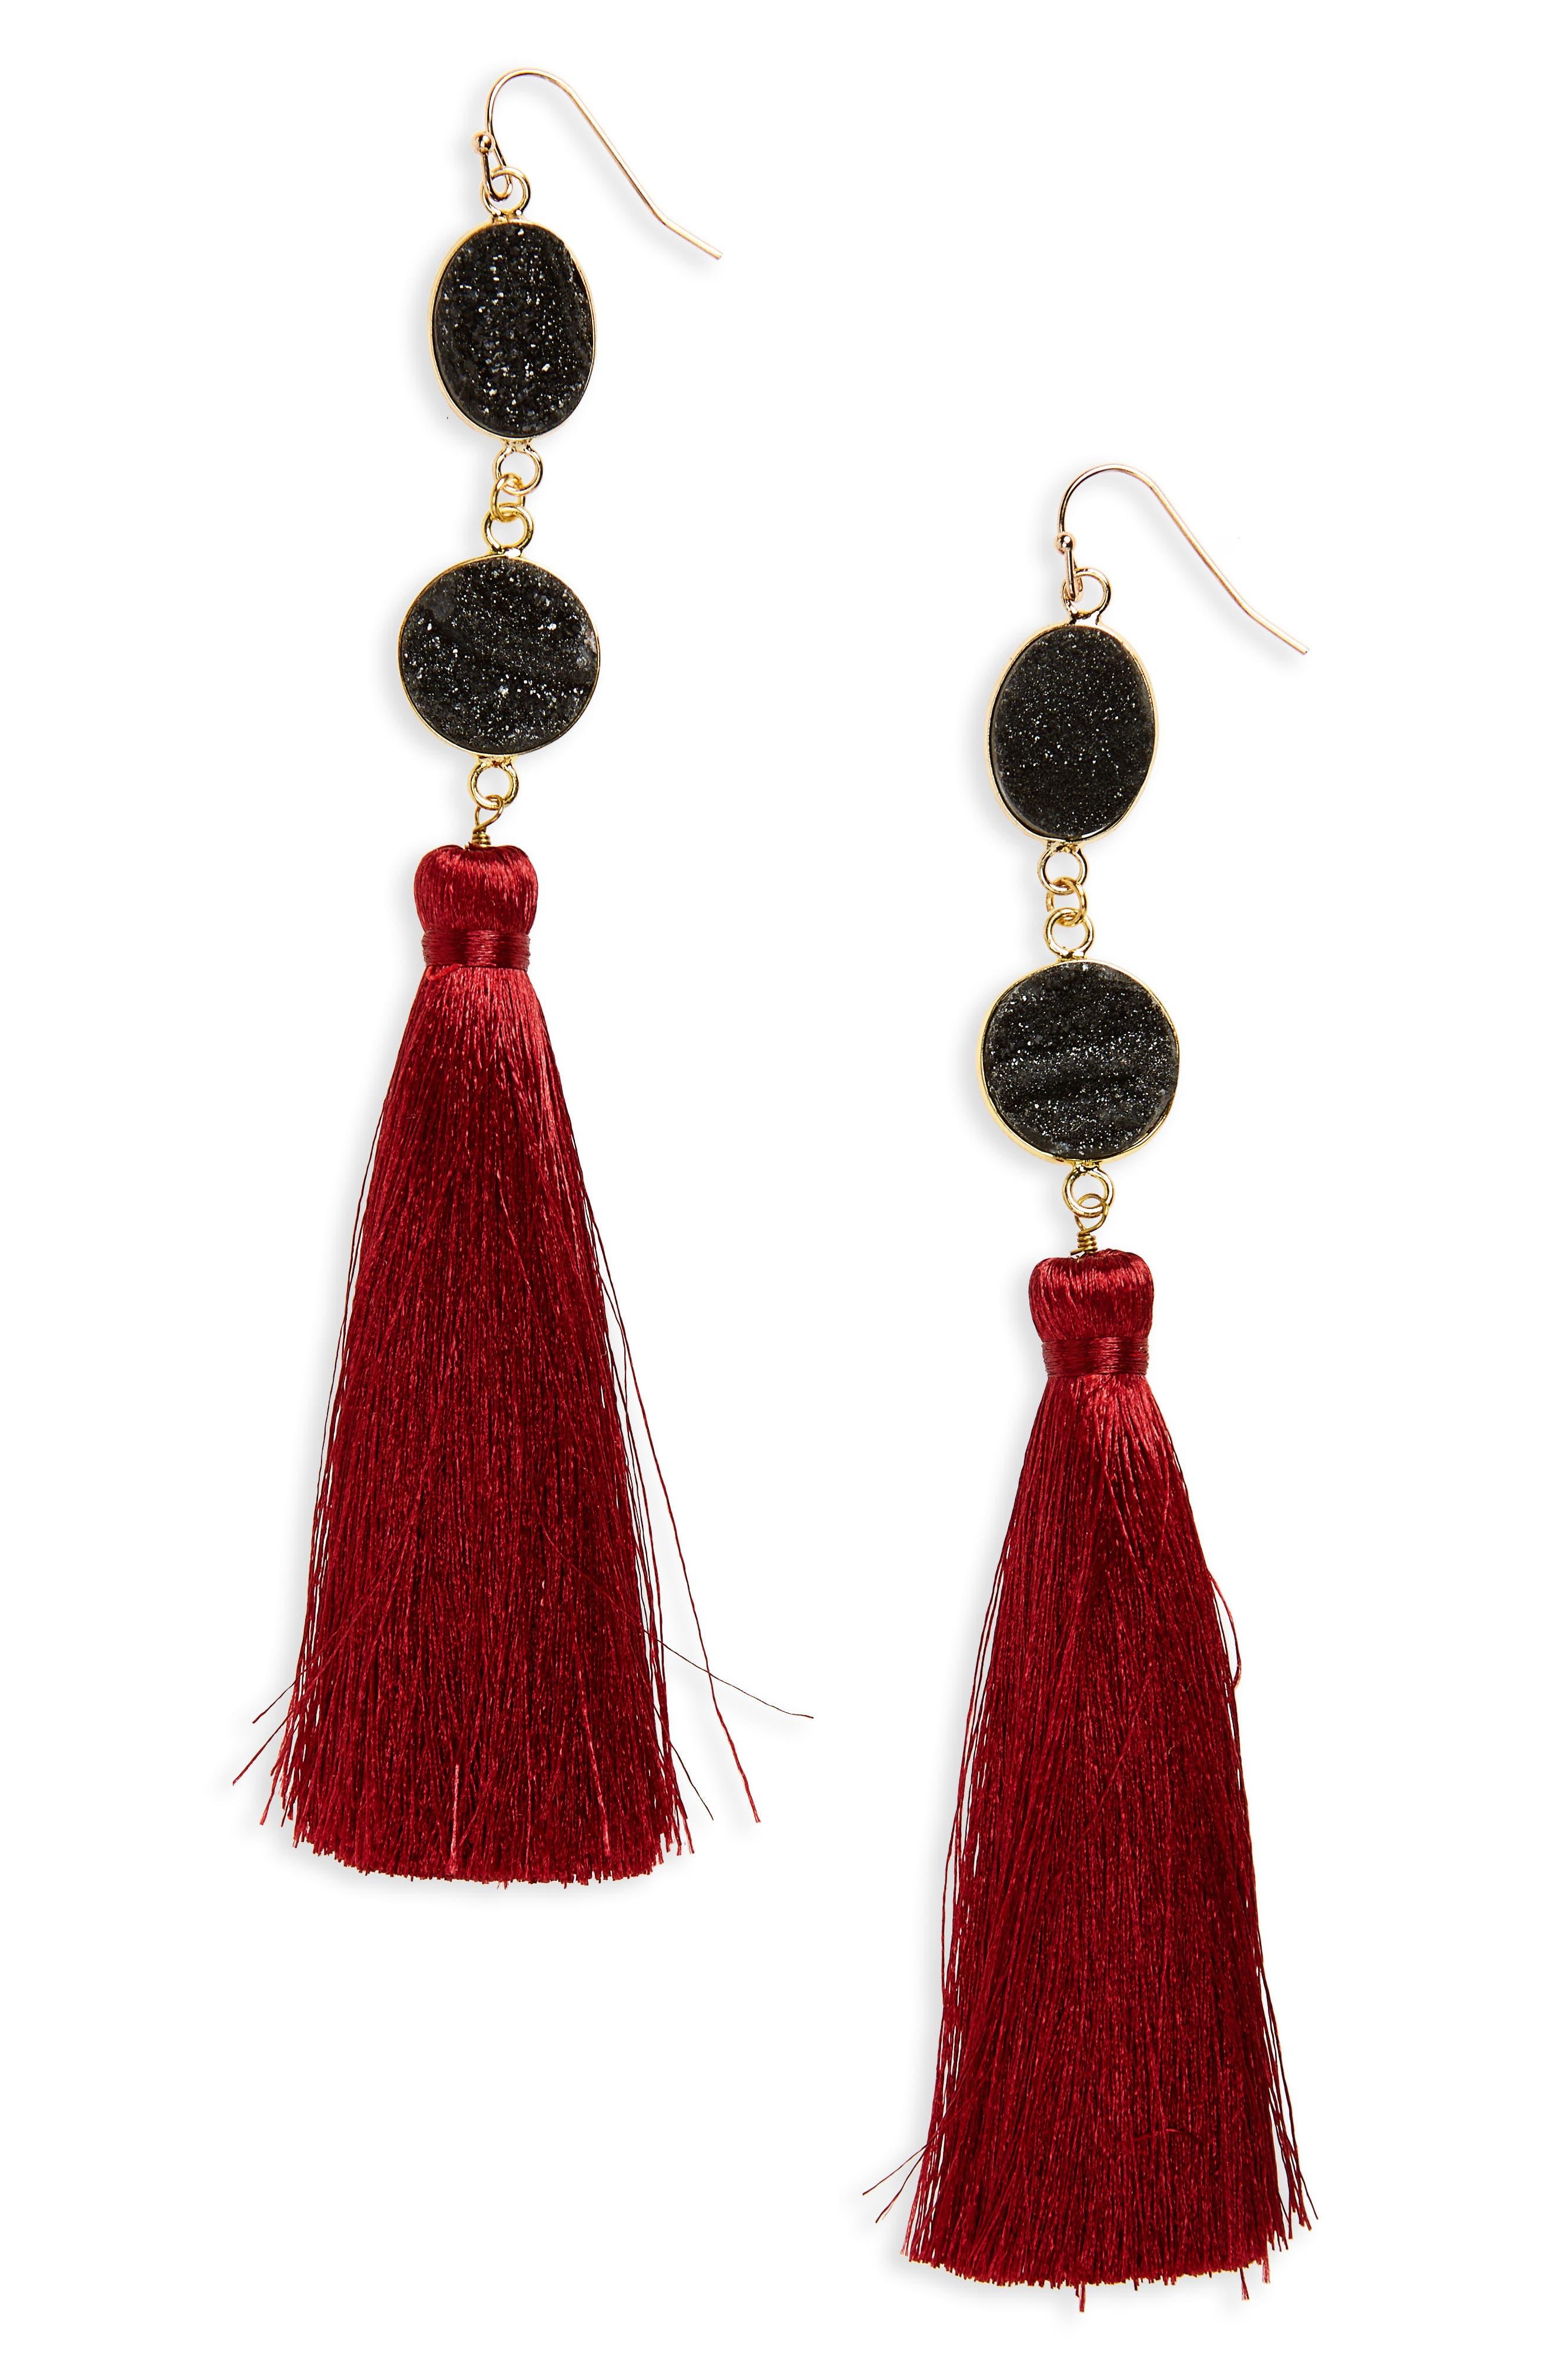 Drusy Quartz Tassel Earrings,                         Main,                         color, Multi